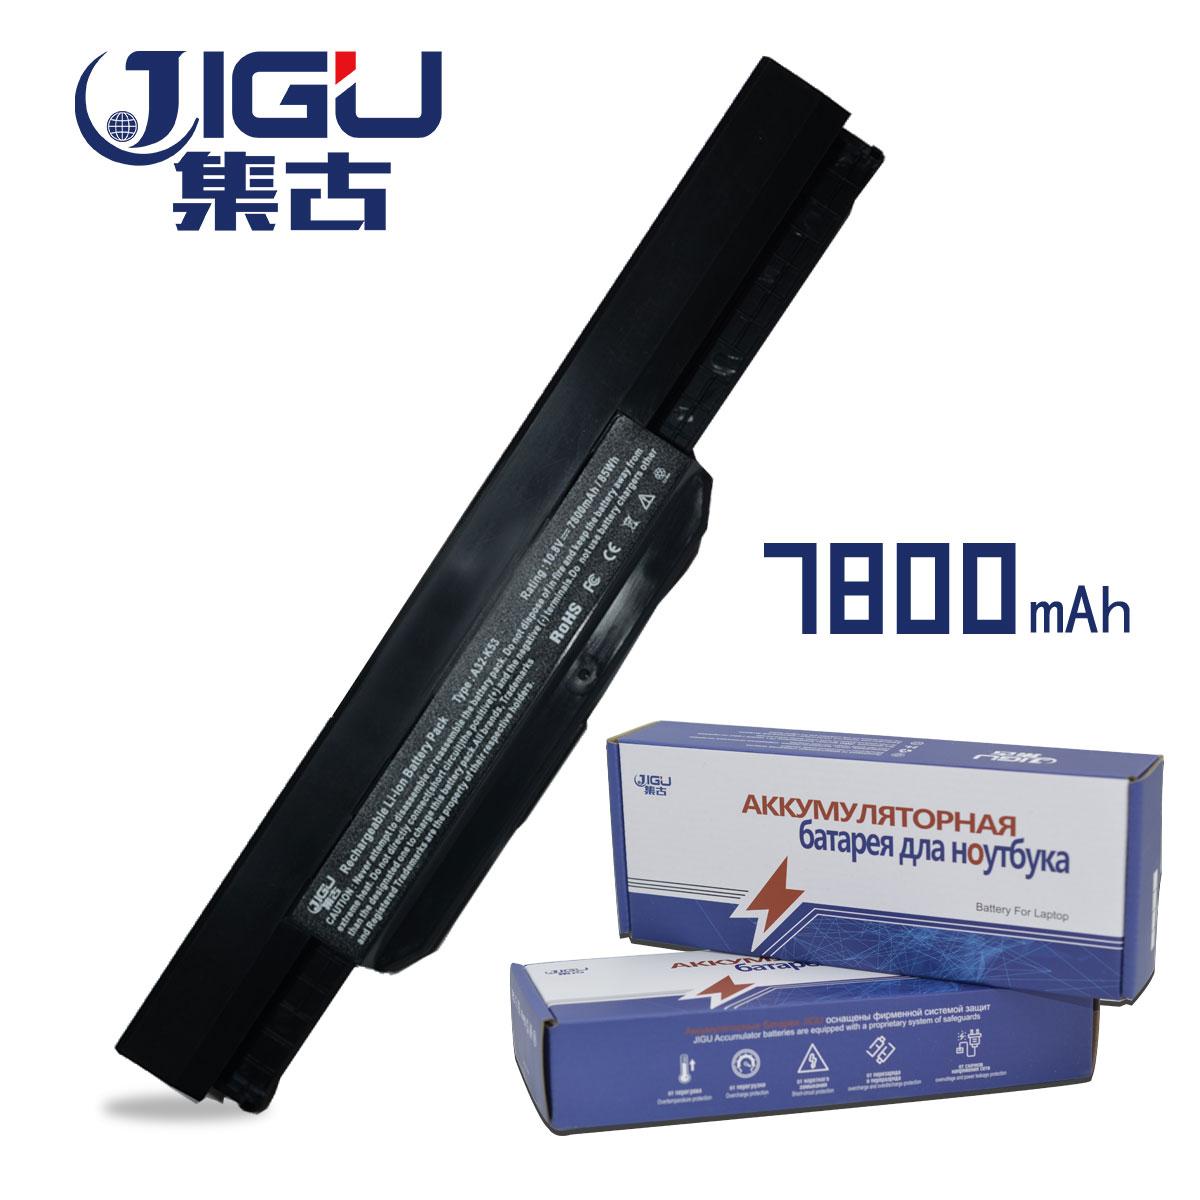 JIGU Laptop Battery A32-K53 For Asus A43 A43J A53J A53 K43 K53 K53s X43 X43s X44 X53 X54 X84 X53S A54 K53B K84 K53E K53F K54JIGU Laptop Battery A32-K53 For Asus A43 A43J A53J A53 K43 K53 K53s X43 X43s X44 X53 X54 X84 X53S A54 K53B K84 K53E K53F K54